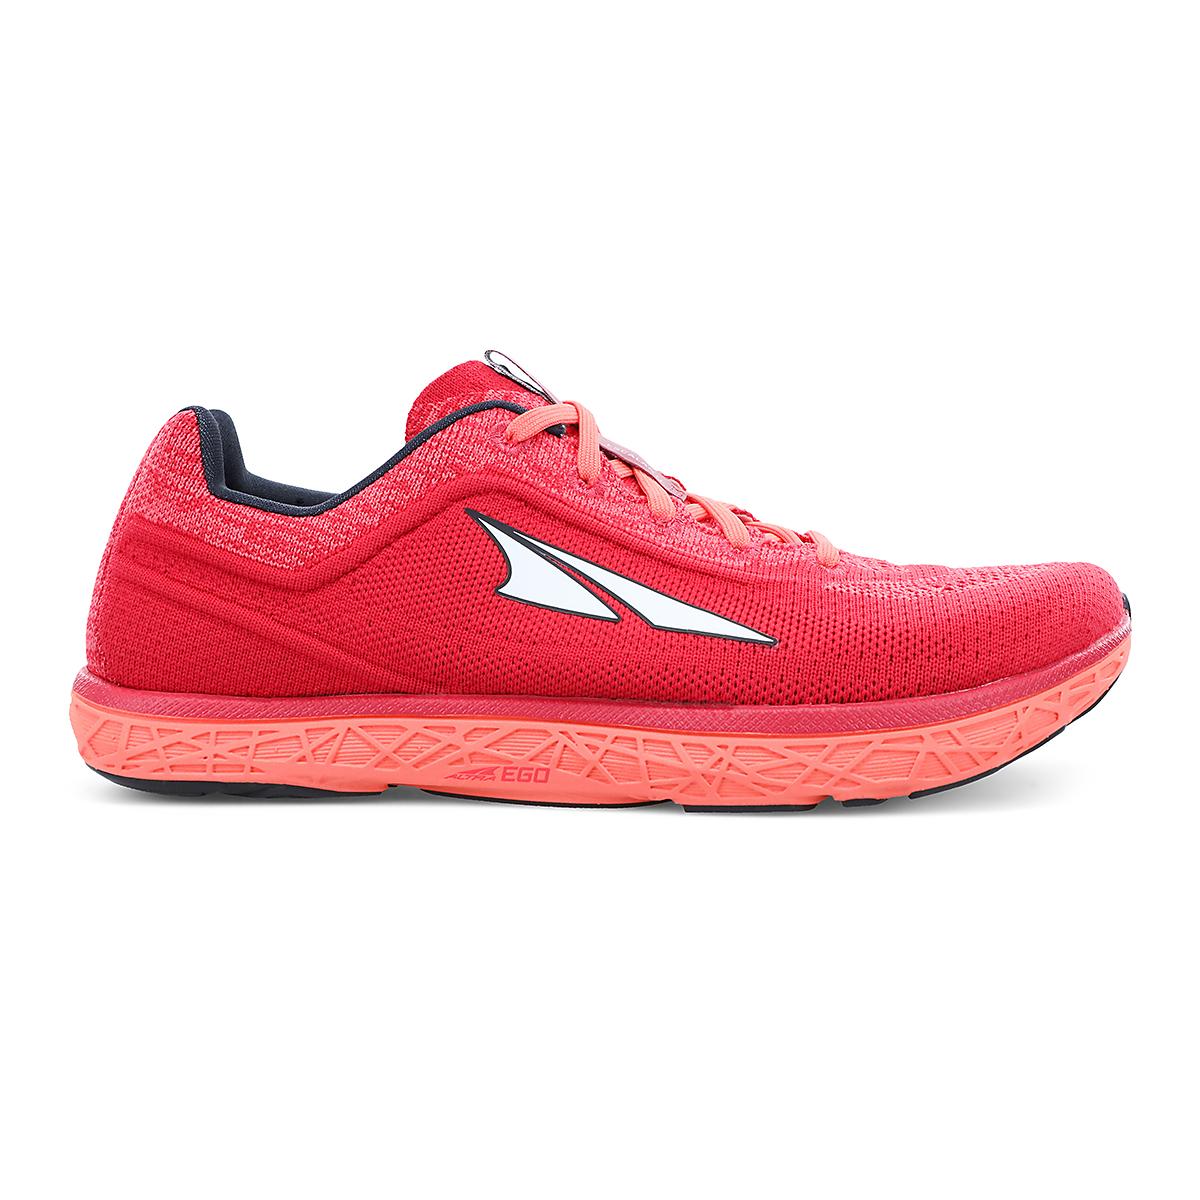 Women's Altra Escalante 2.5 Running Shoe - Color: Raspberry - Size: 5.5 - Width: Regular, Raspberry, large, image 1